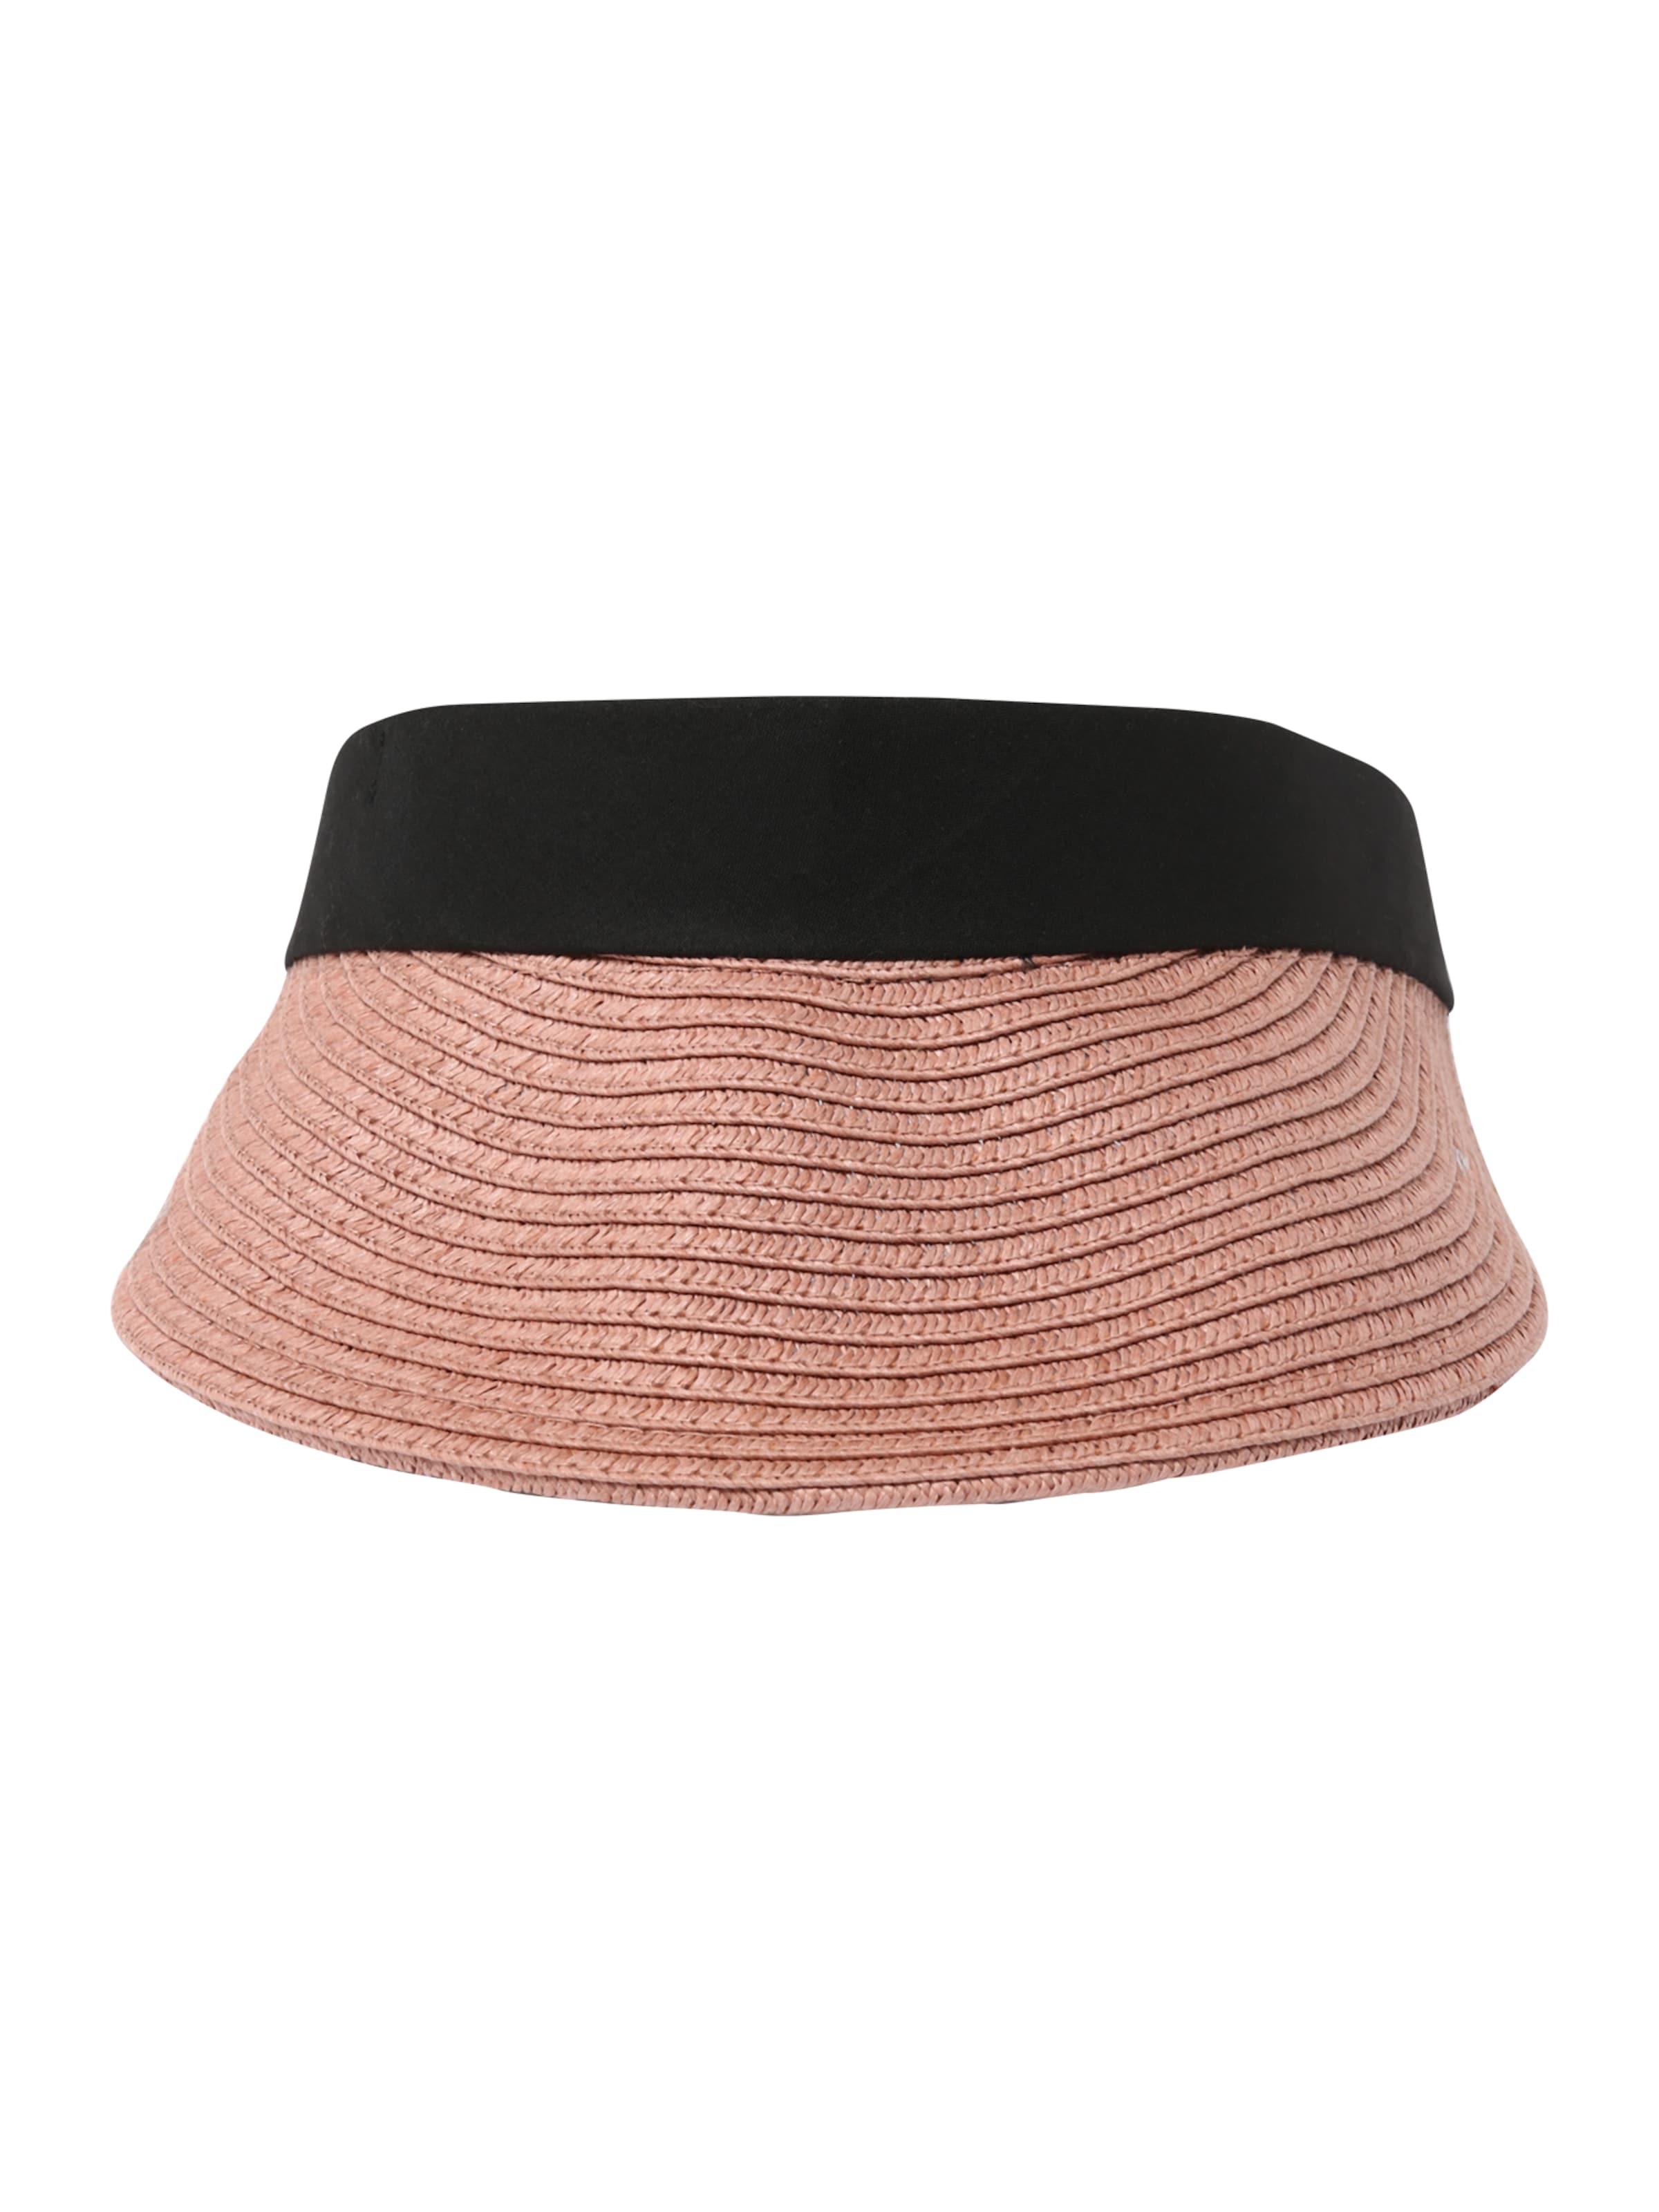 Mint amp;ampberryCasquette amp;ampberryCasquette Rosé 'headgear' Rosé Mint amp;ampberryCasquette 'headgear' In Mint 'headgear' In N8kXn0wOP